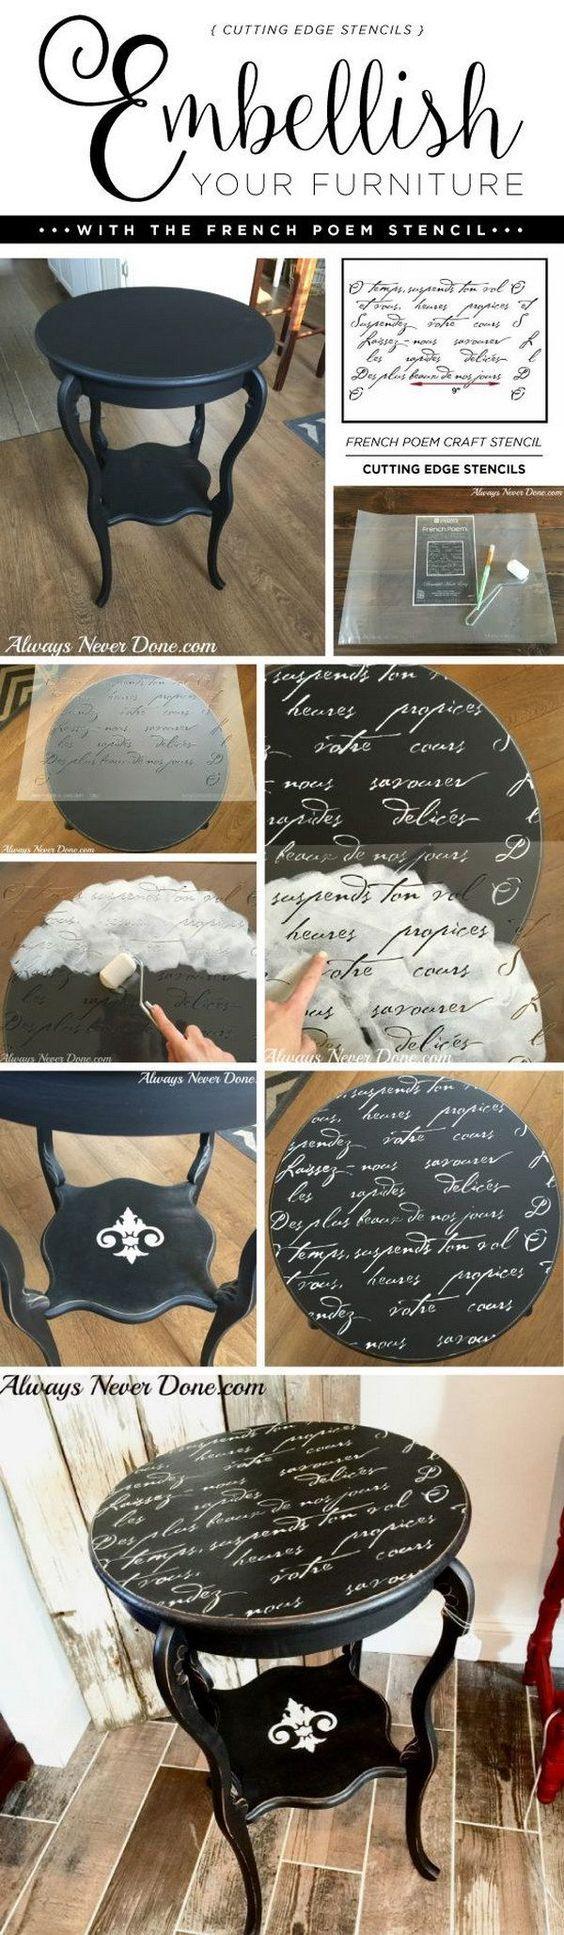 Awesome Shabby Chic Decor DIY Ideas